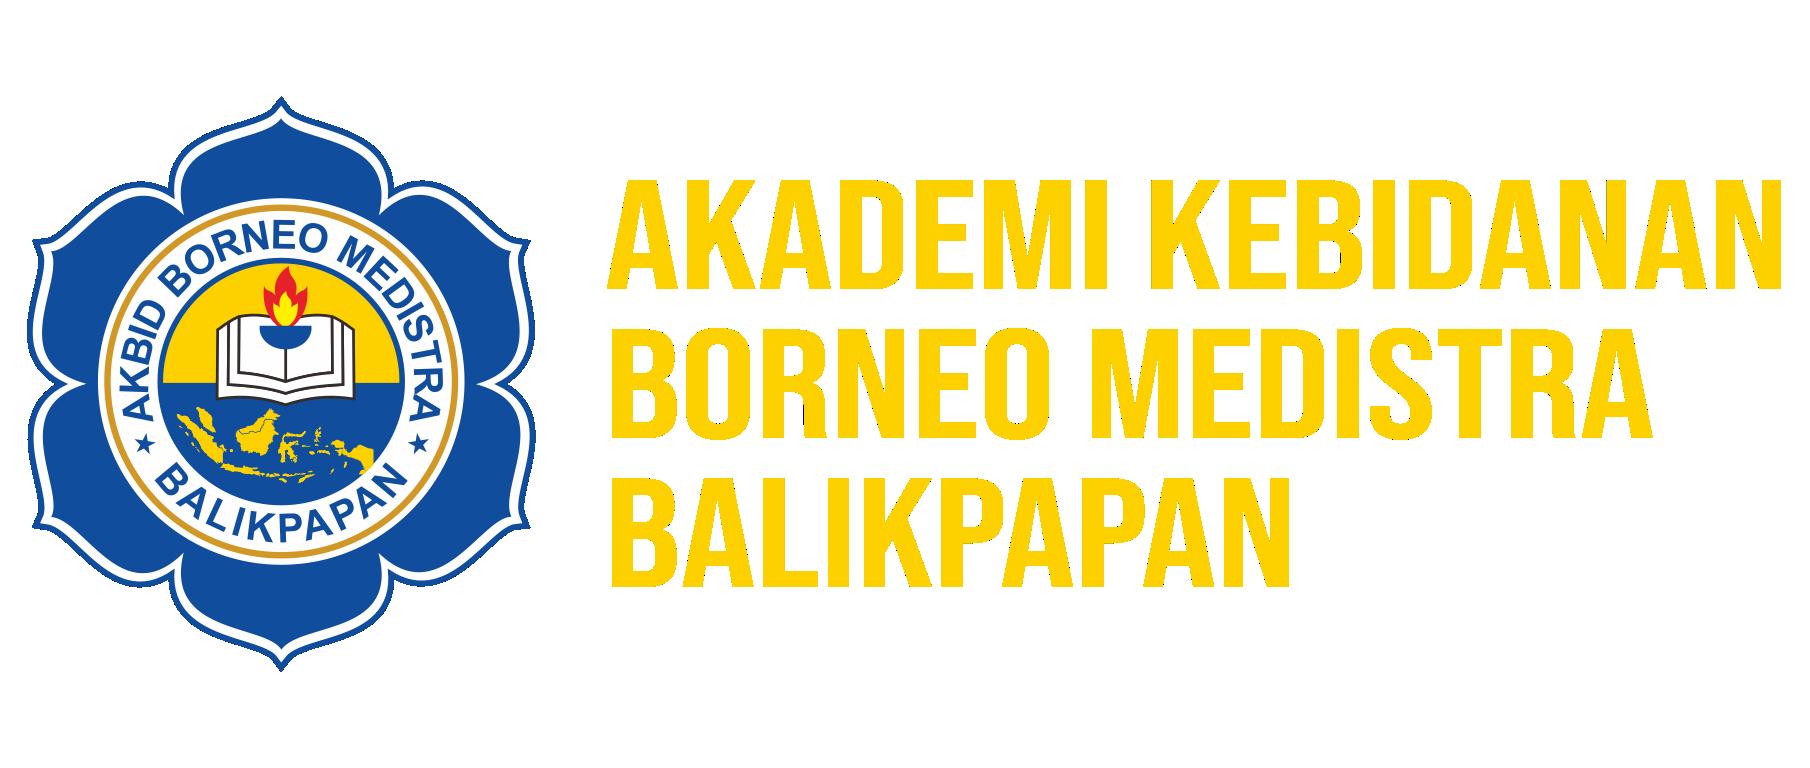 PMB Akademi Kebidanan Borneo Medistra Balikpapan